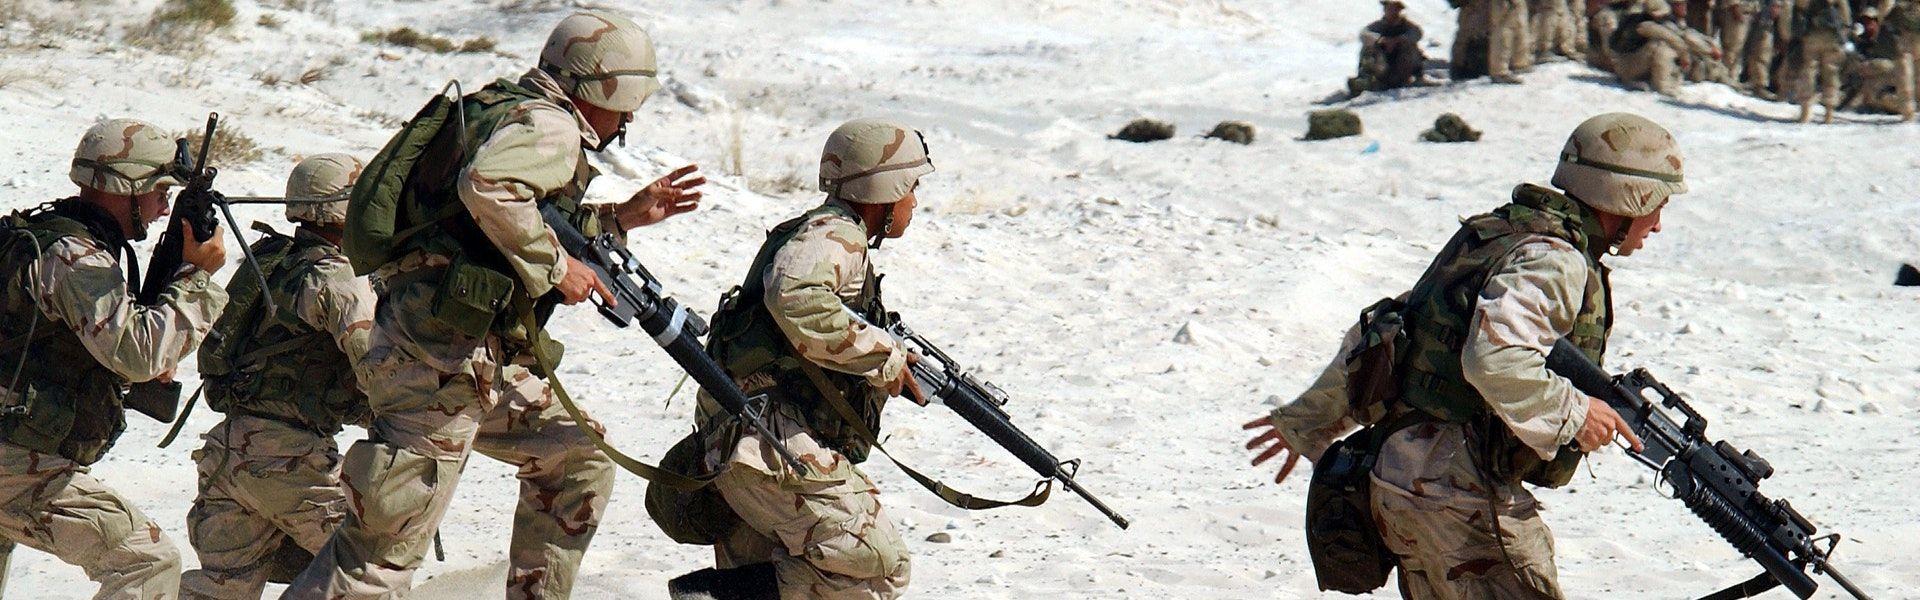 Military Hearing Loss Claims